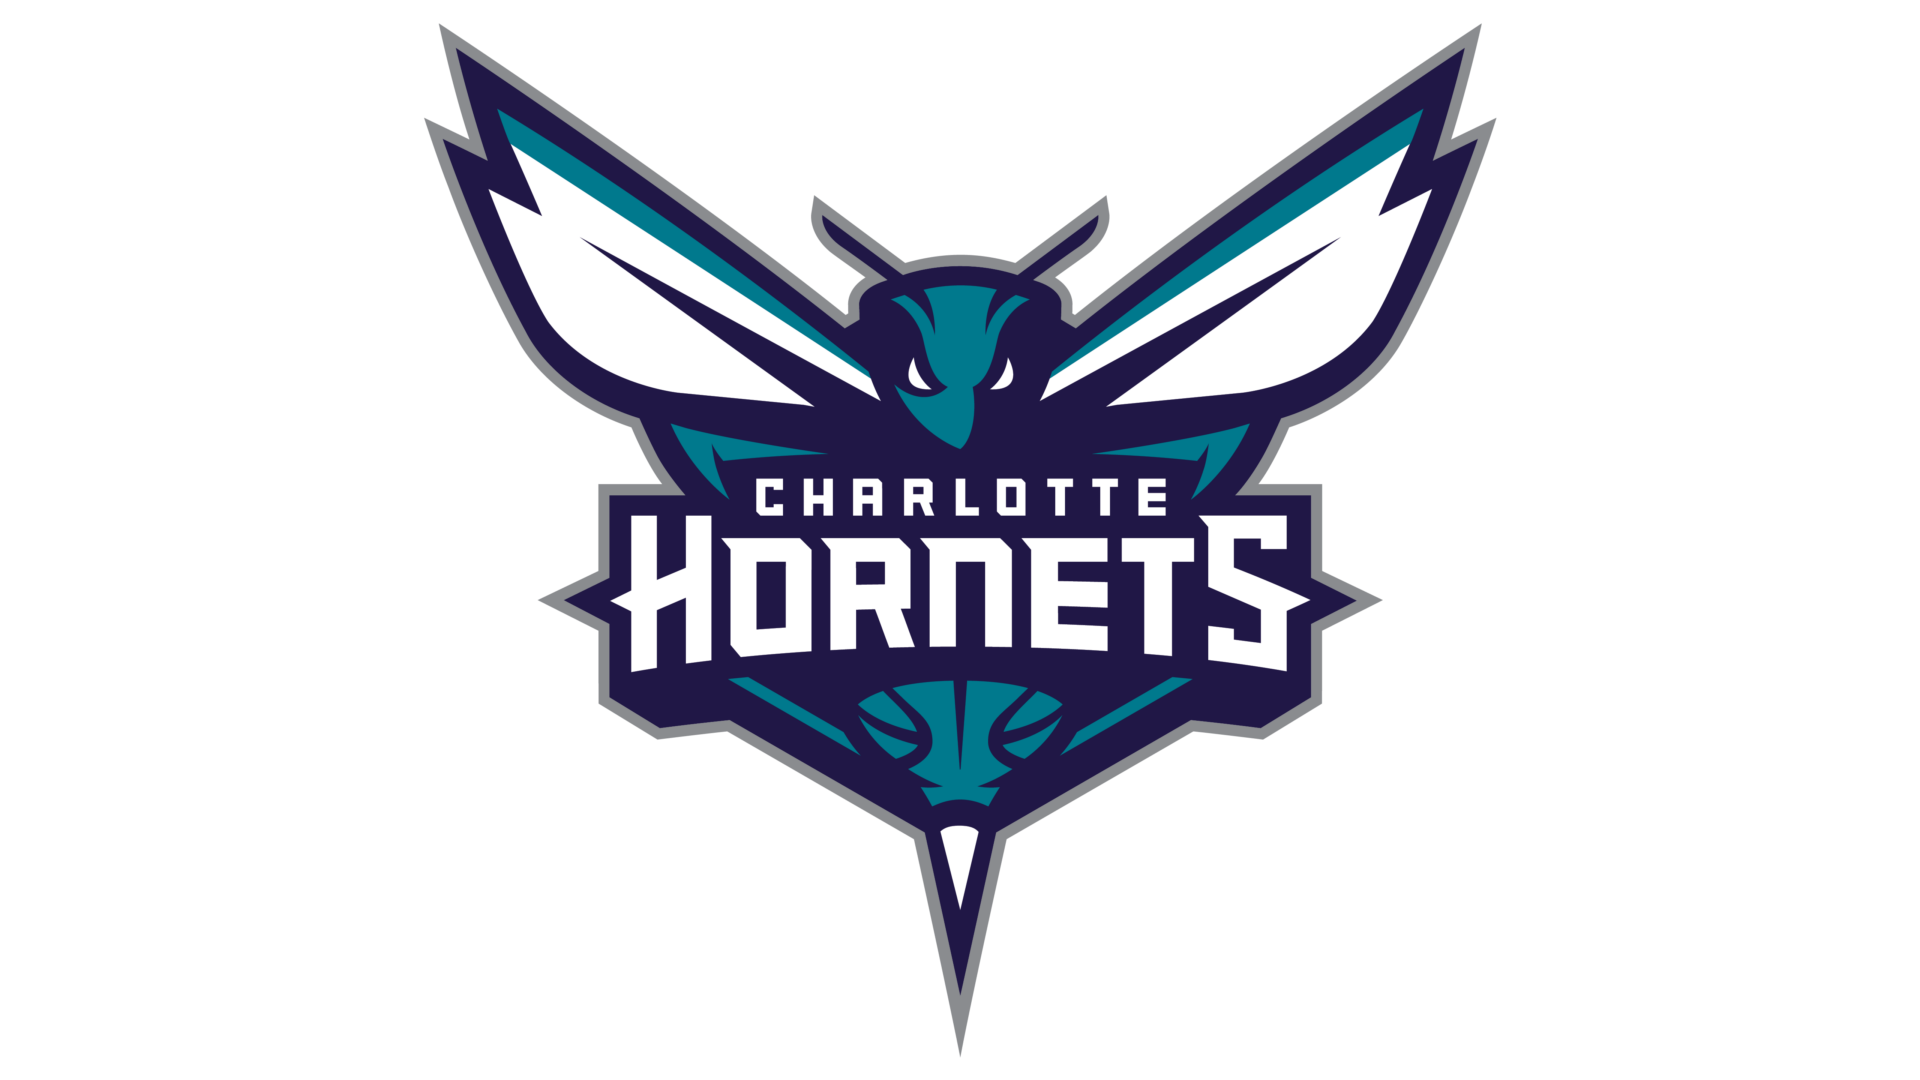 https://secureservercdn.net/198.71.233.179/mjf.381.myftpupload.com/wp-content/uploads/2021/07/Charlotte_Hornets_wide.png